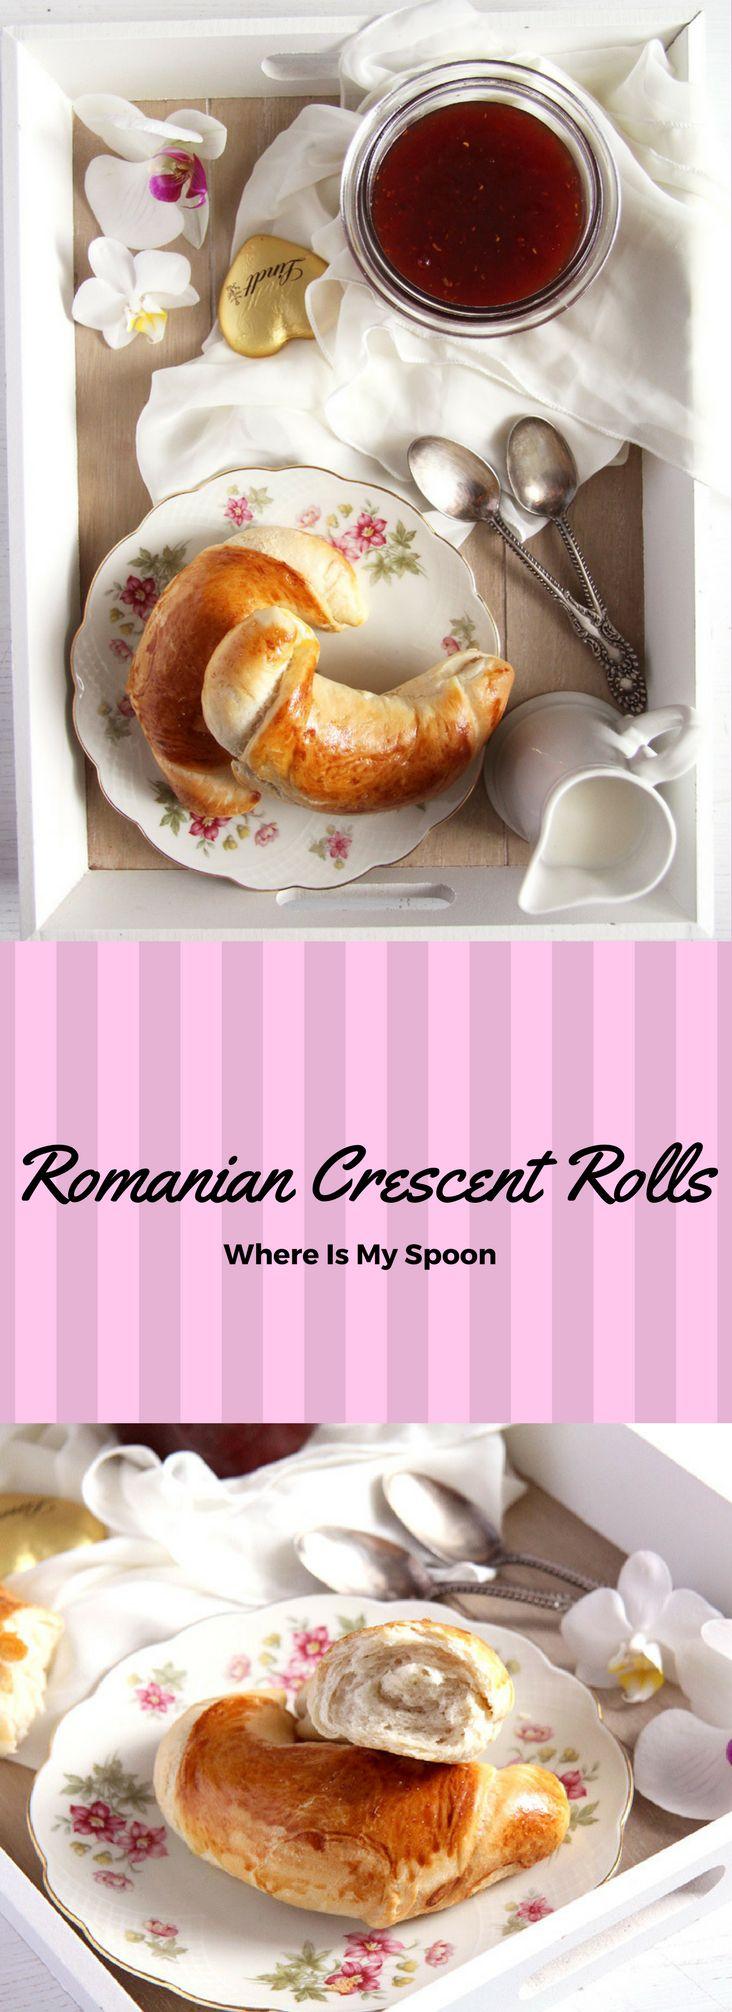 Romanian Crescent Rolls